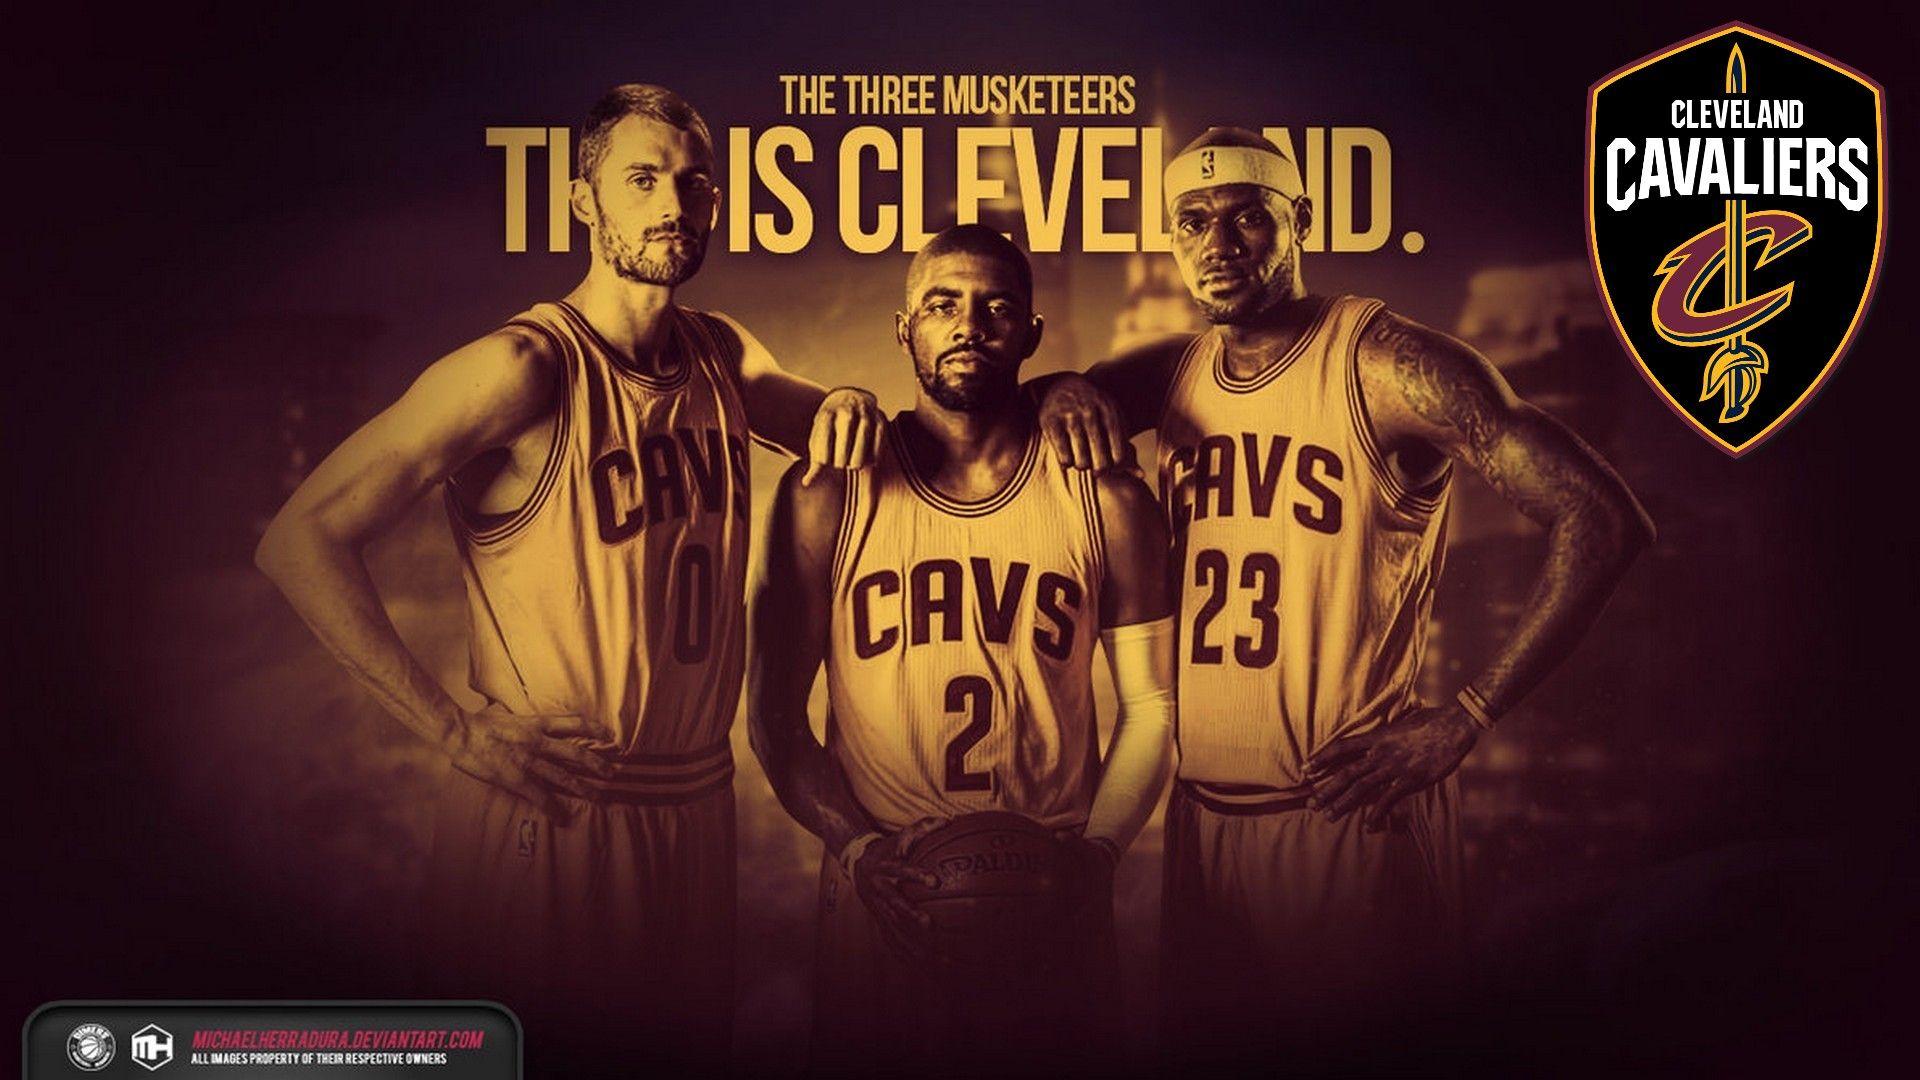 Big 3 Cleveland Cavaliers Wallpaper Hd 2021 Basketball Wallpaper Cavaliers Wallpaper Lebron James Background Lebron James Cleveland